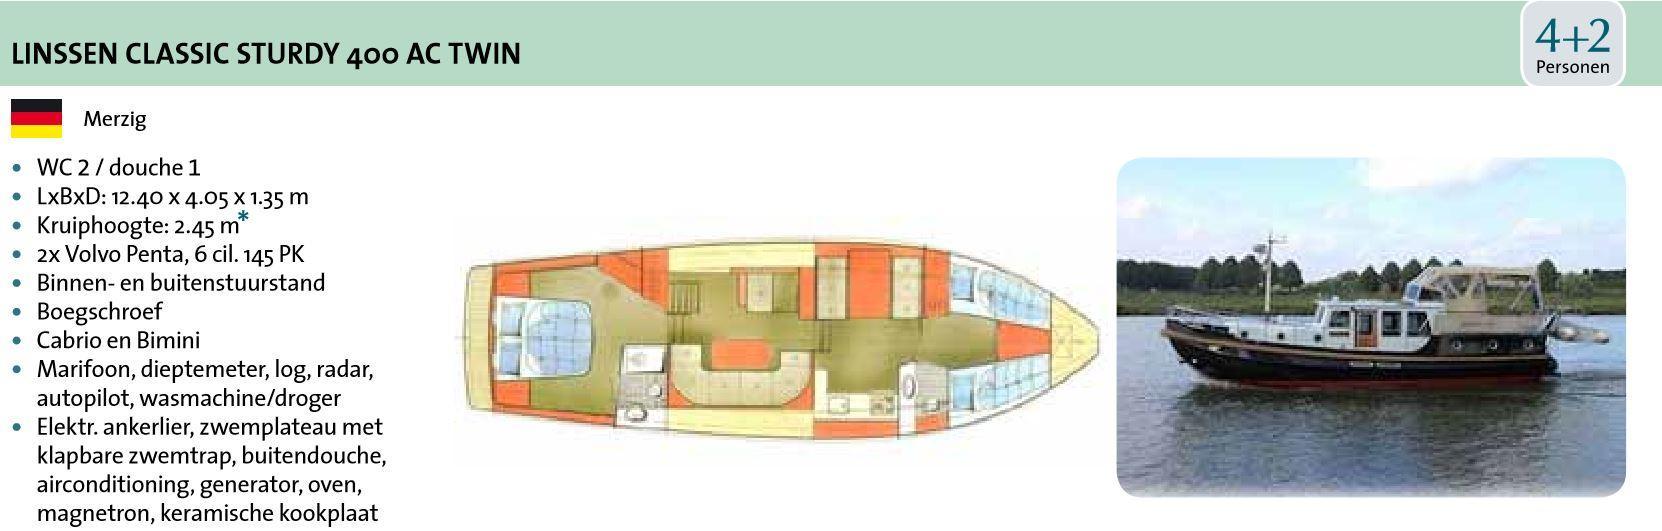 Linssen Classic Sturdy 400 Ac Twin Bboat